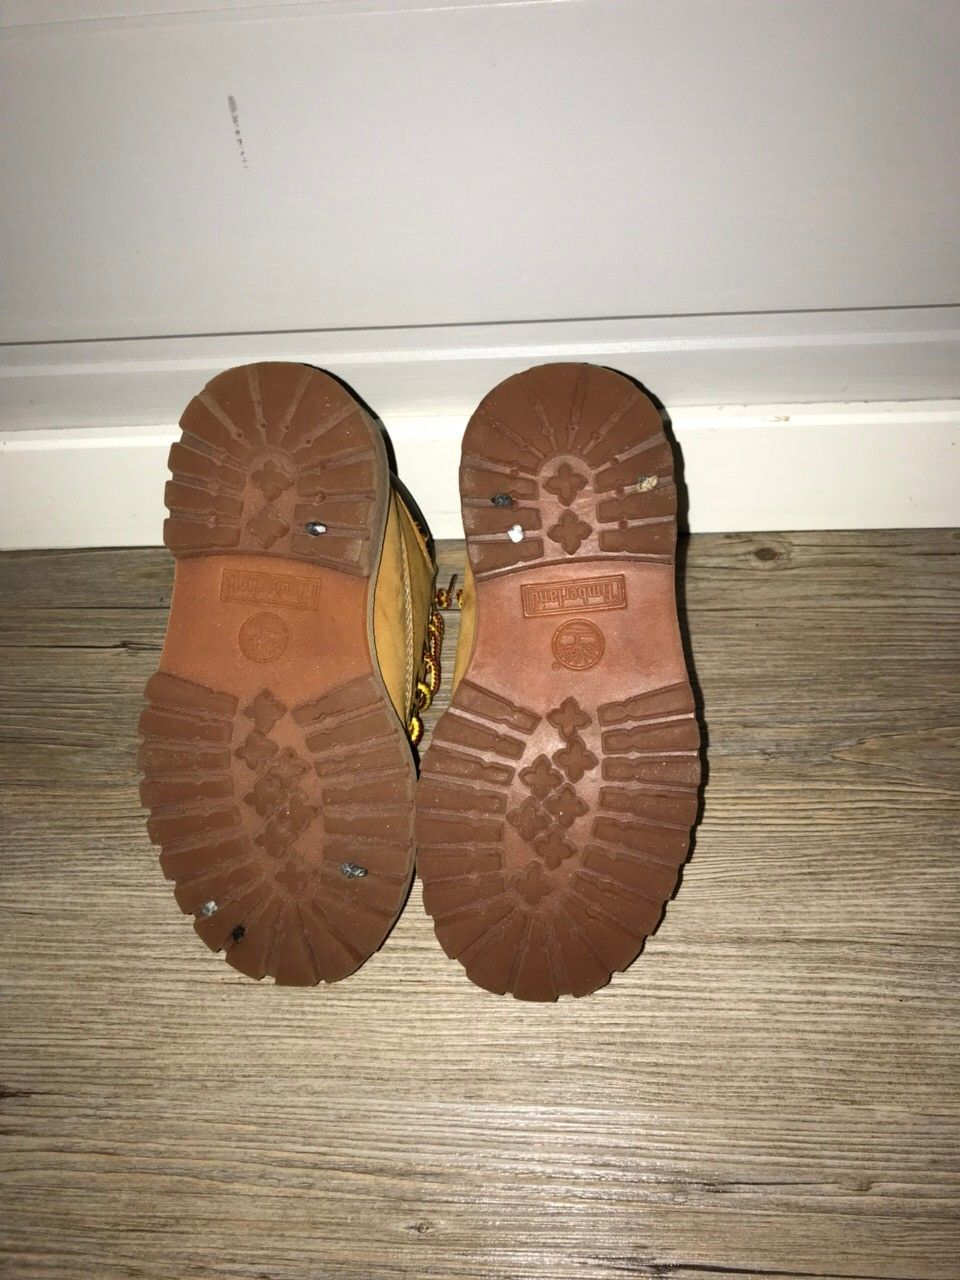 Timberland sko strl 26 - Sandefjord  - Timberland sko strl 26 (store i strl) Nypris 999,- lite brukt - Sandefjord